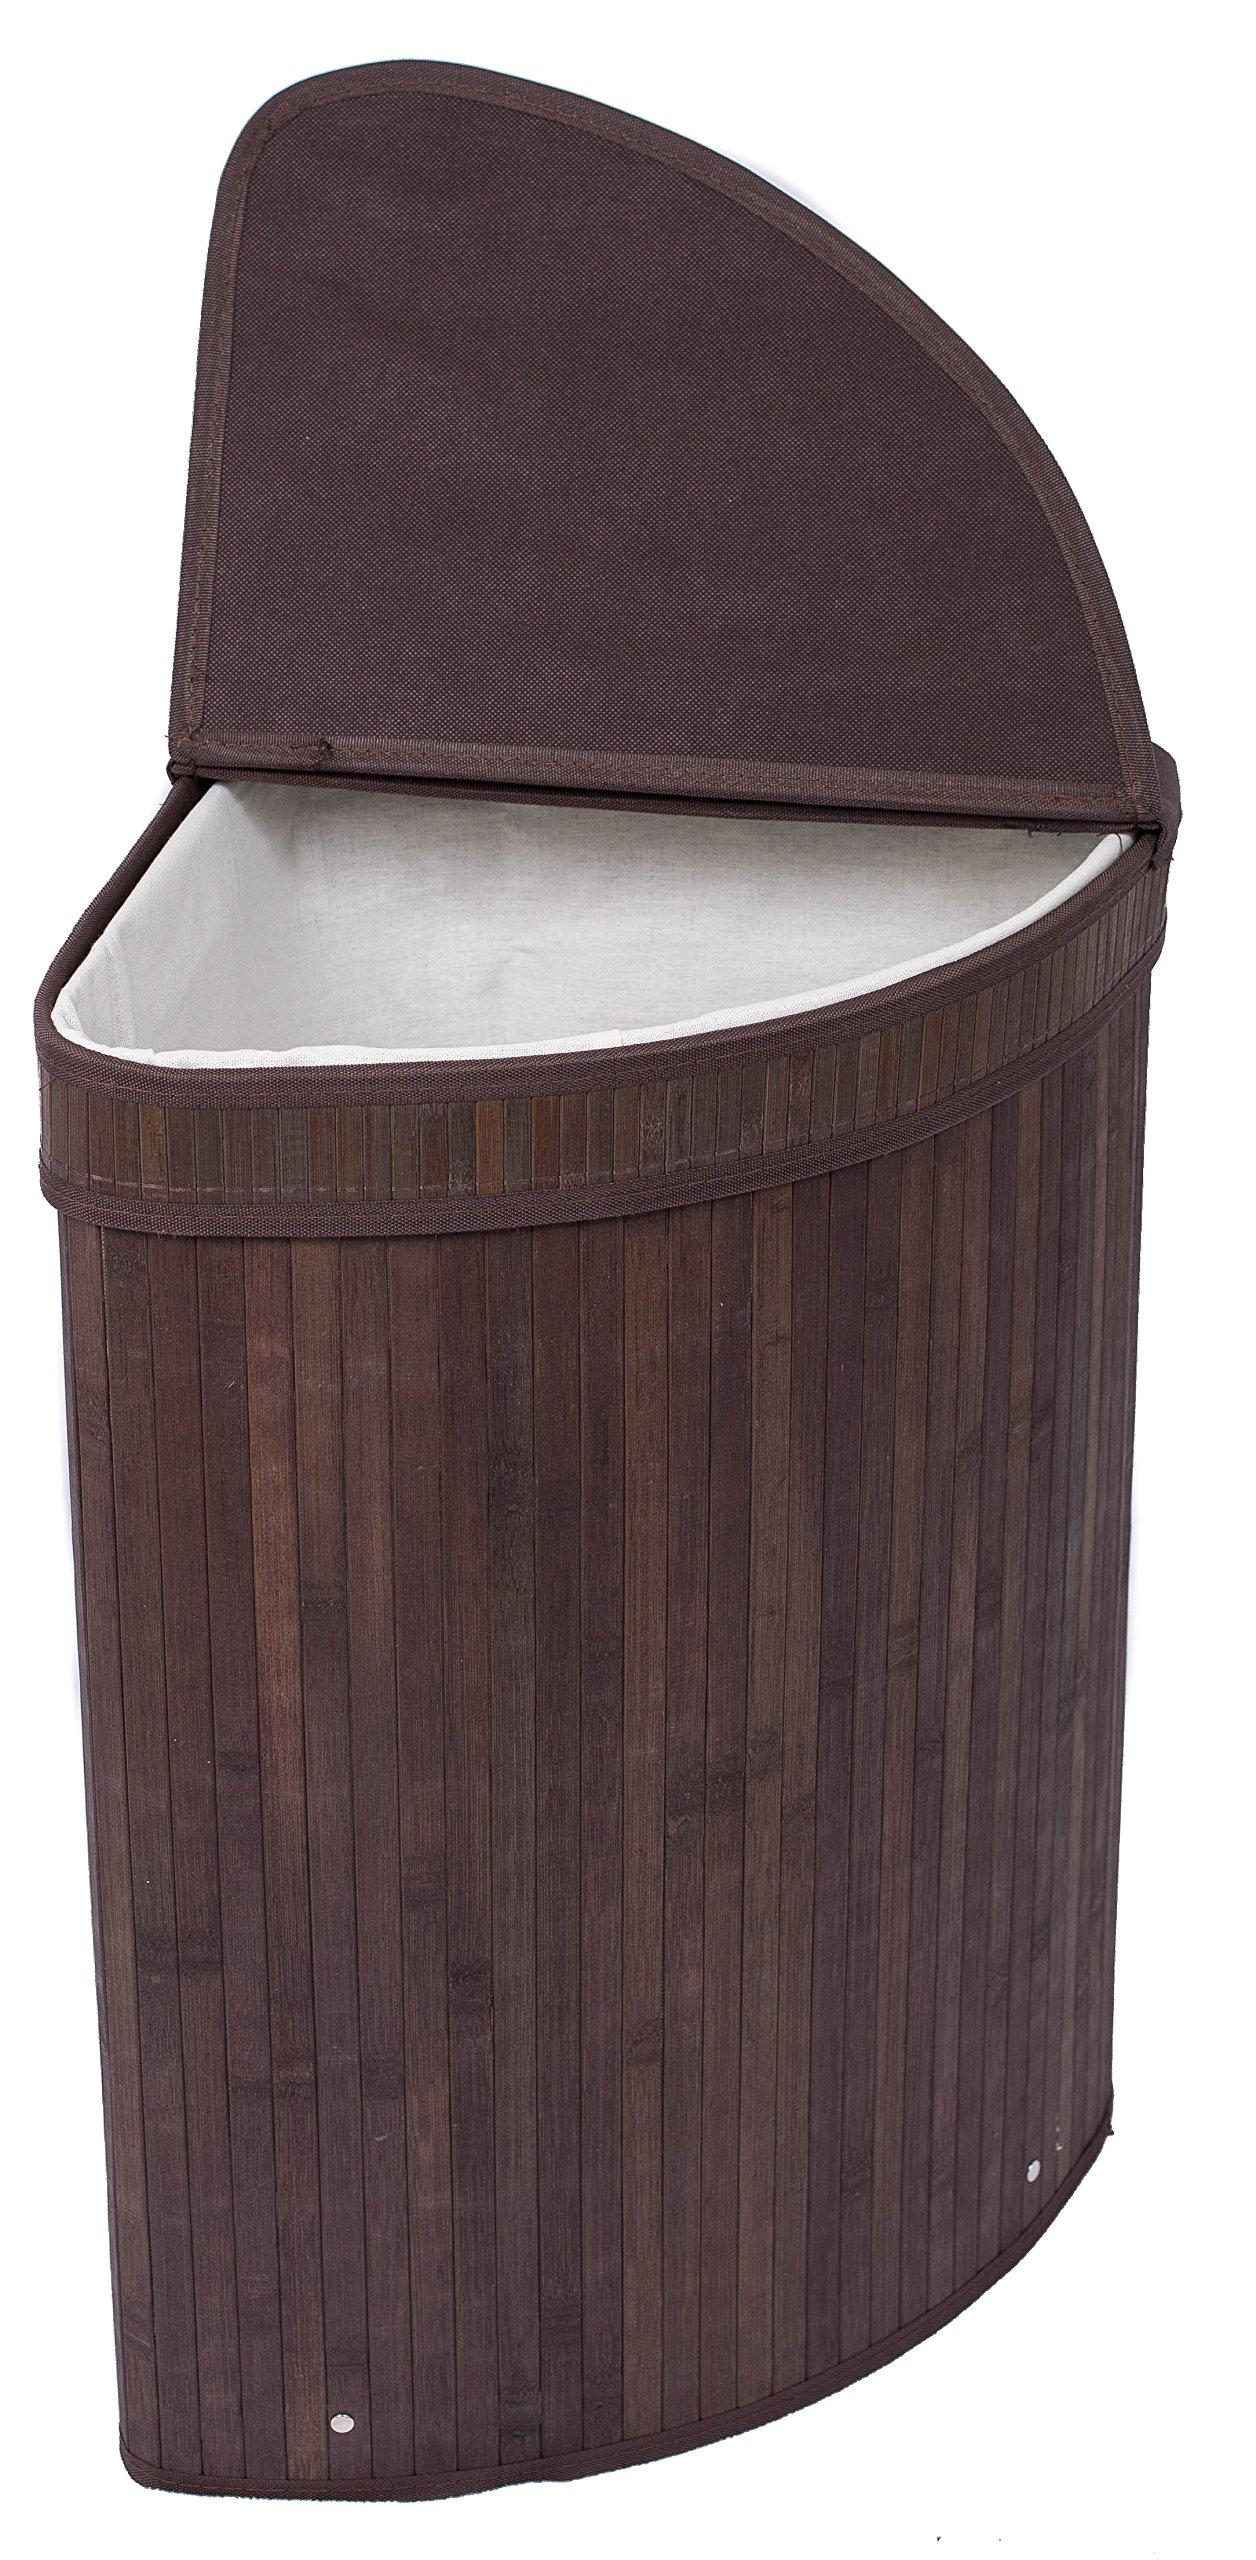 BirdRock Home Corner Laundry Hamper with Lid and Cloth Liner | Bamboo | Espresso | Easily Transport Laundry Basket | Collapsible Hamper | String Handle